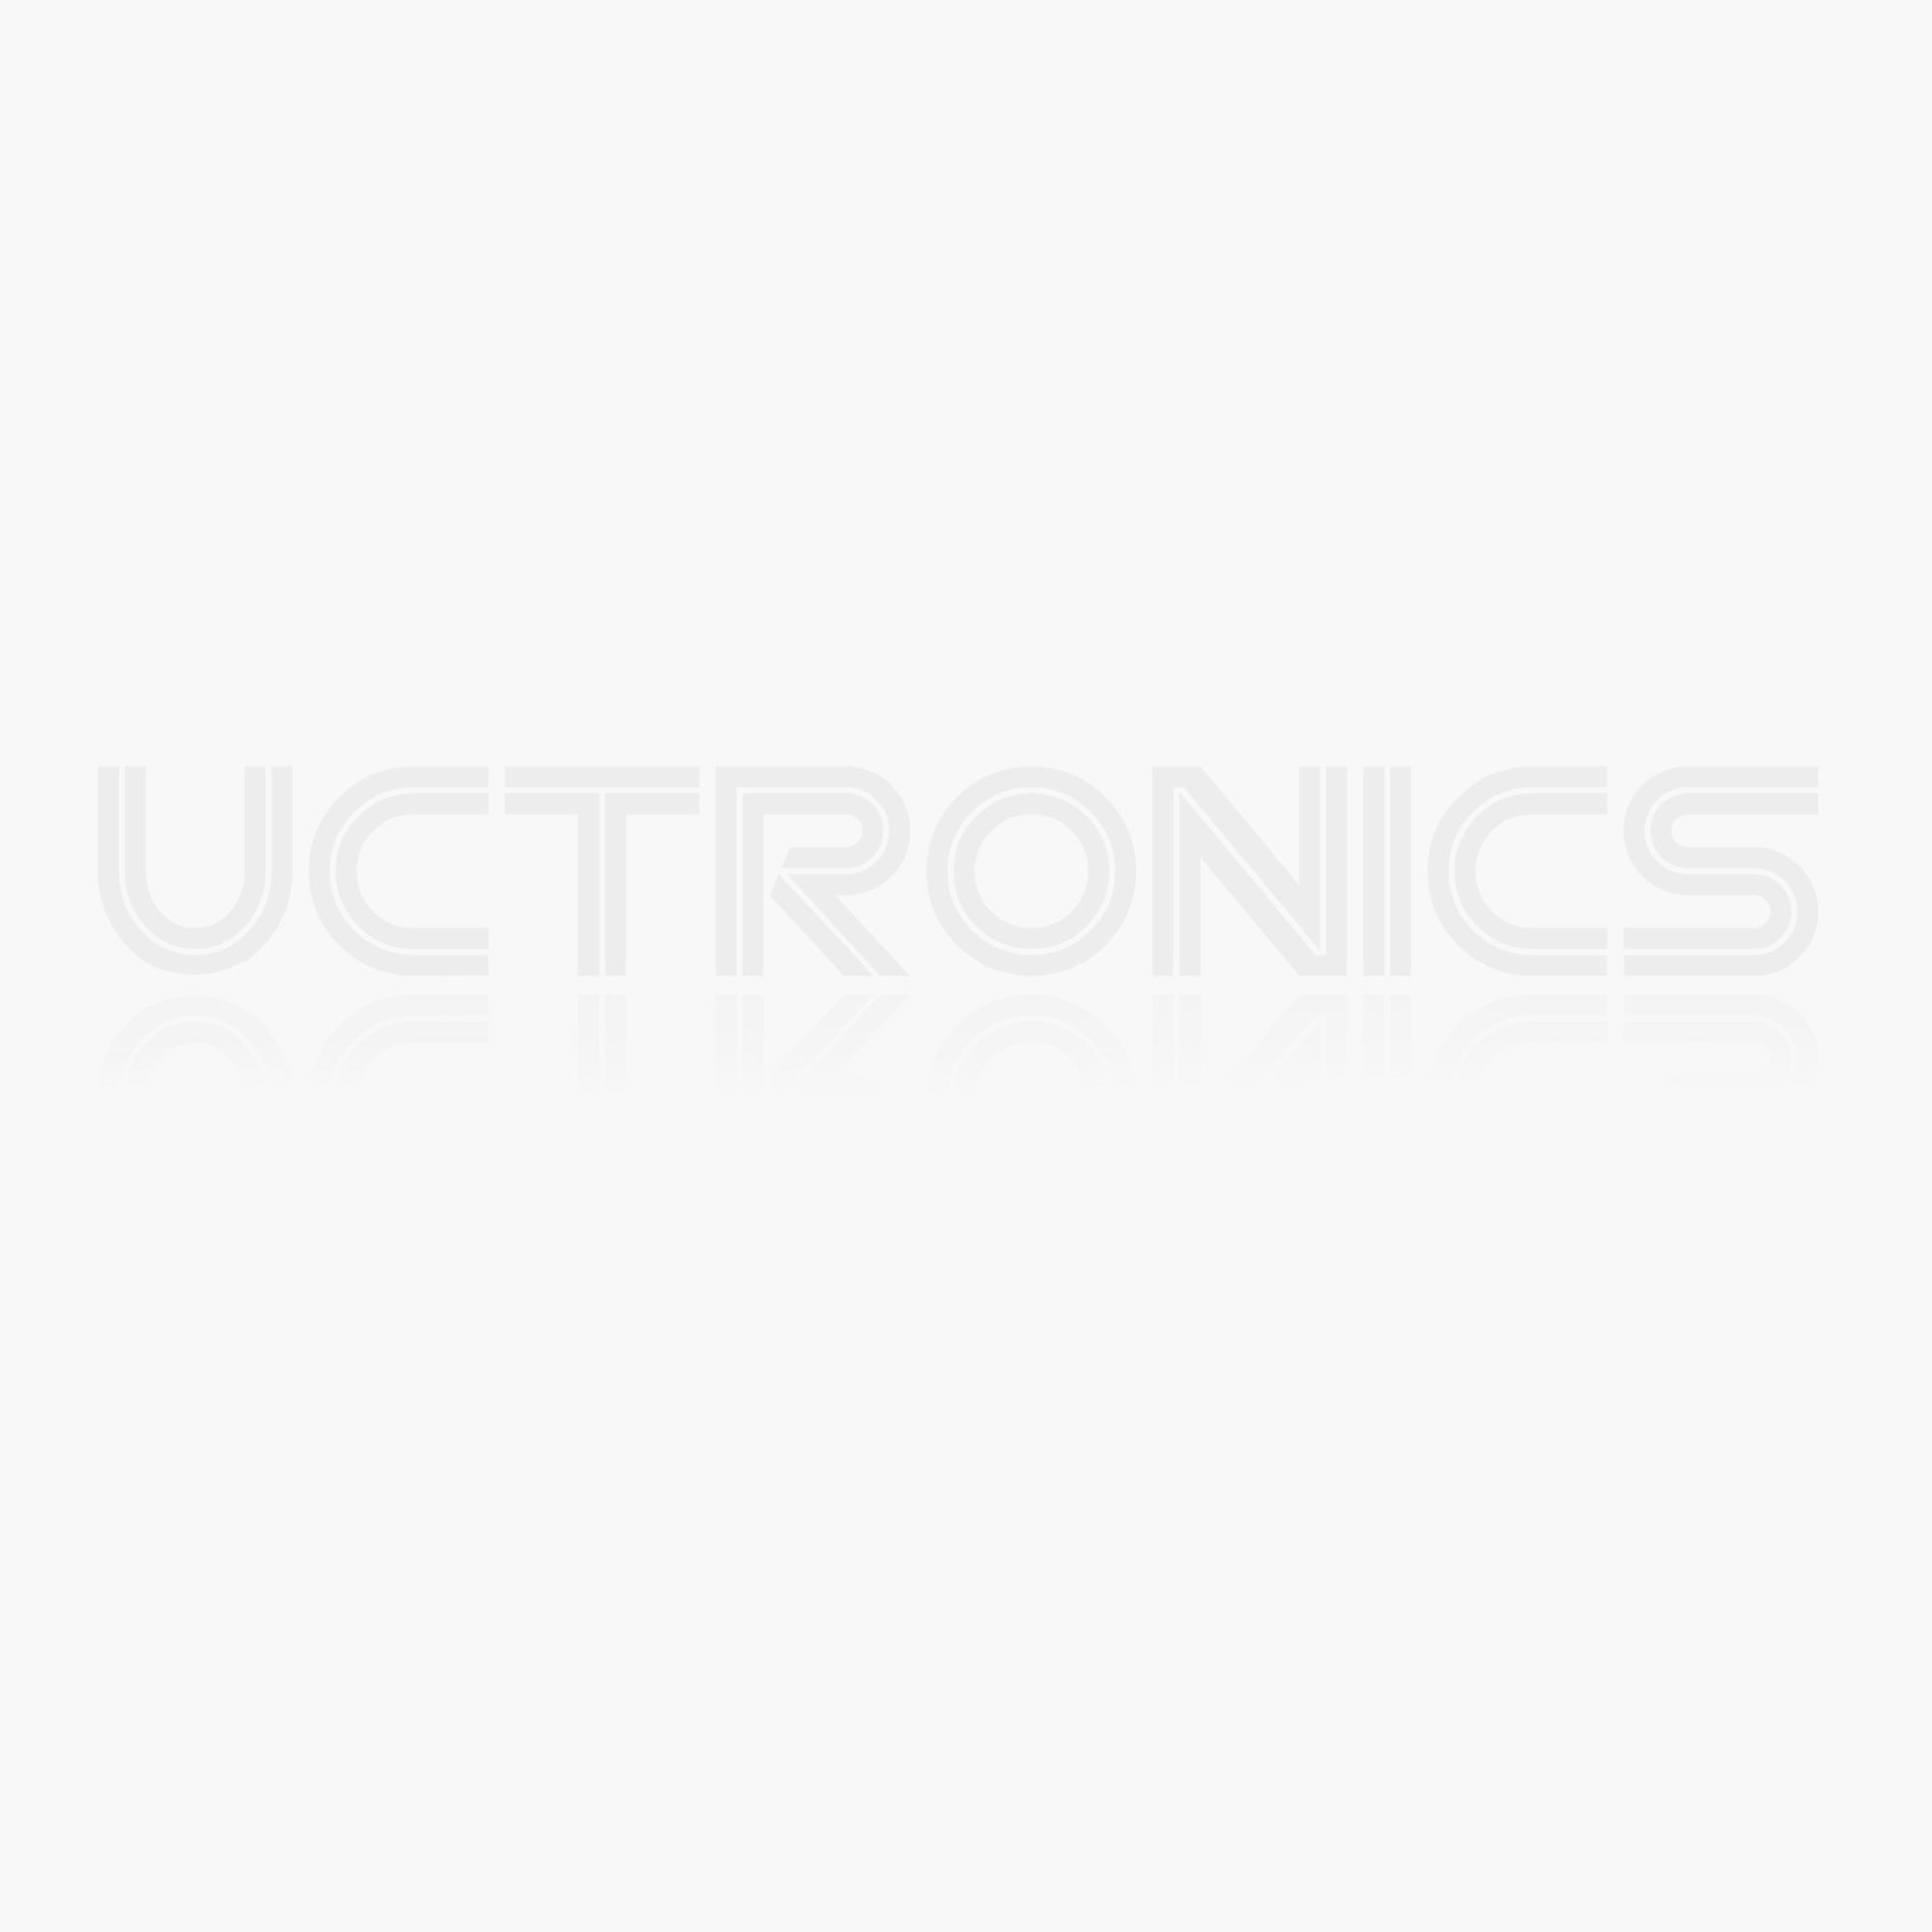 5pcs 15cm Servo Cable RC Extension Lead Wire Cable